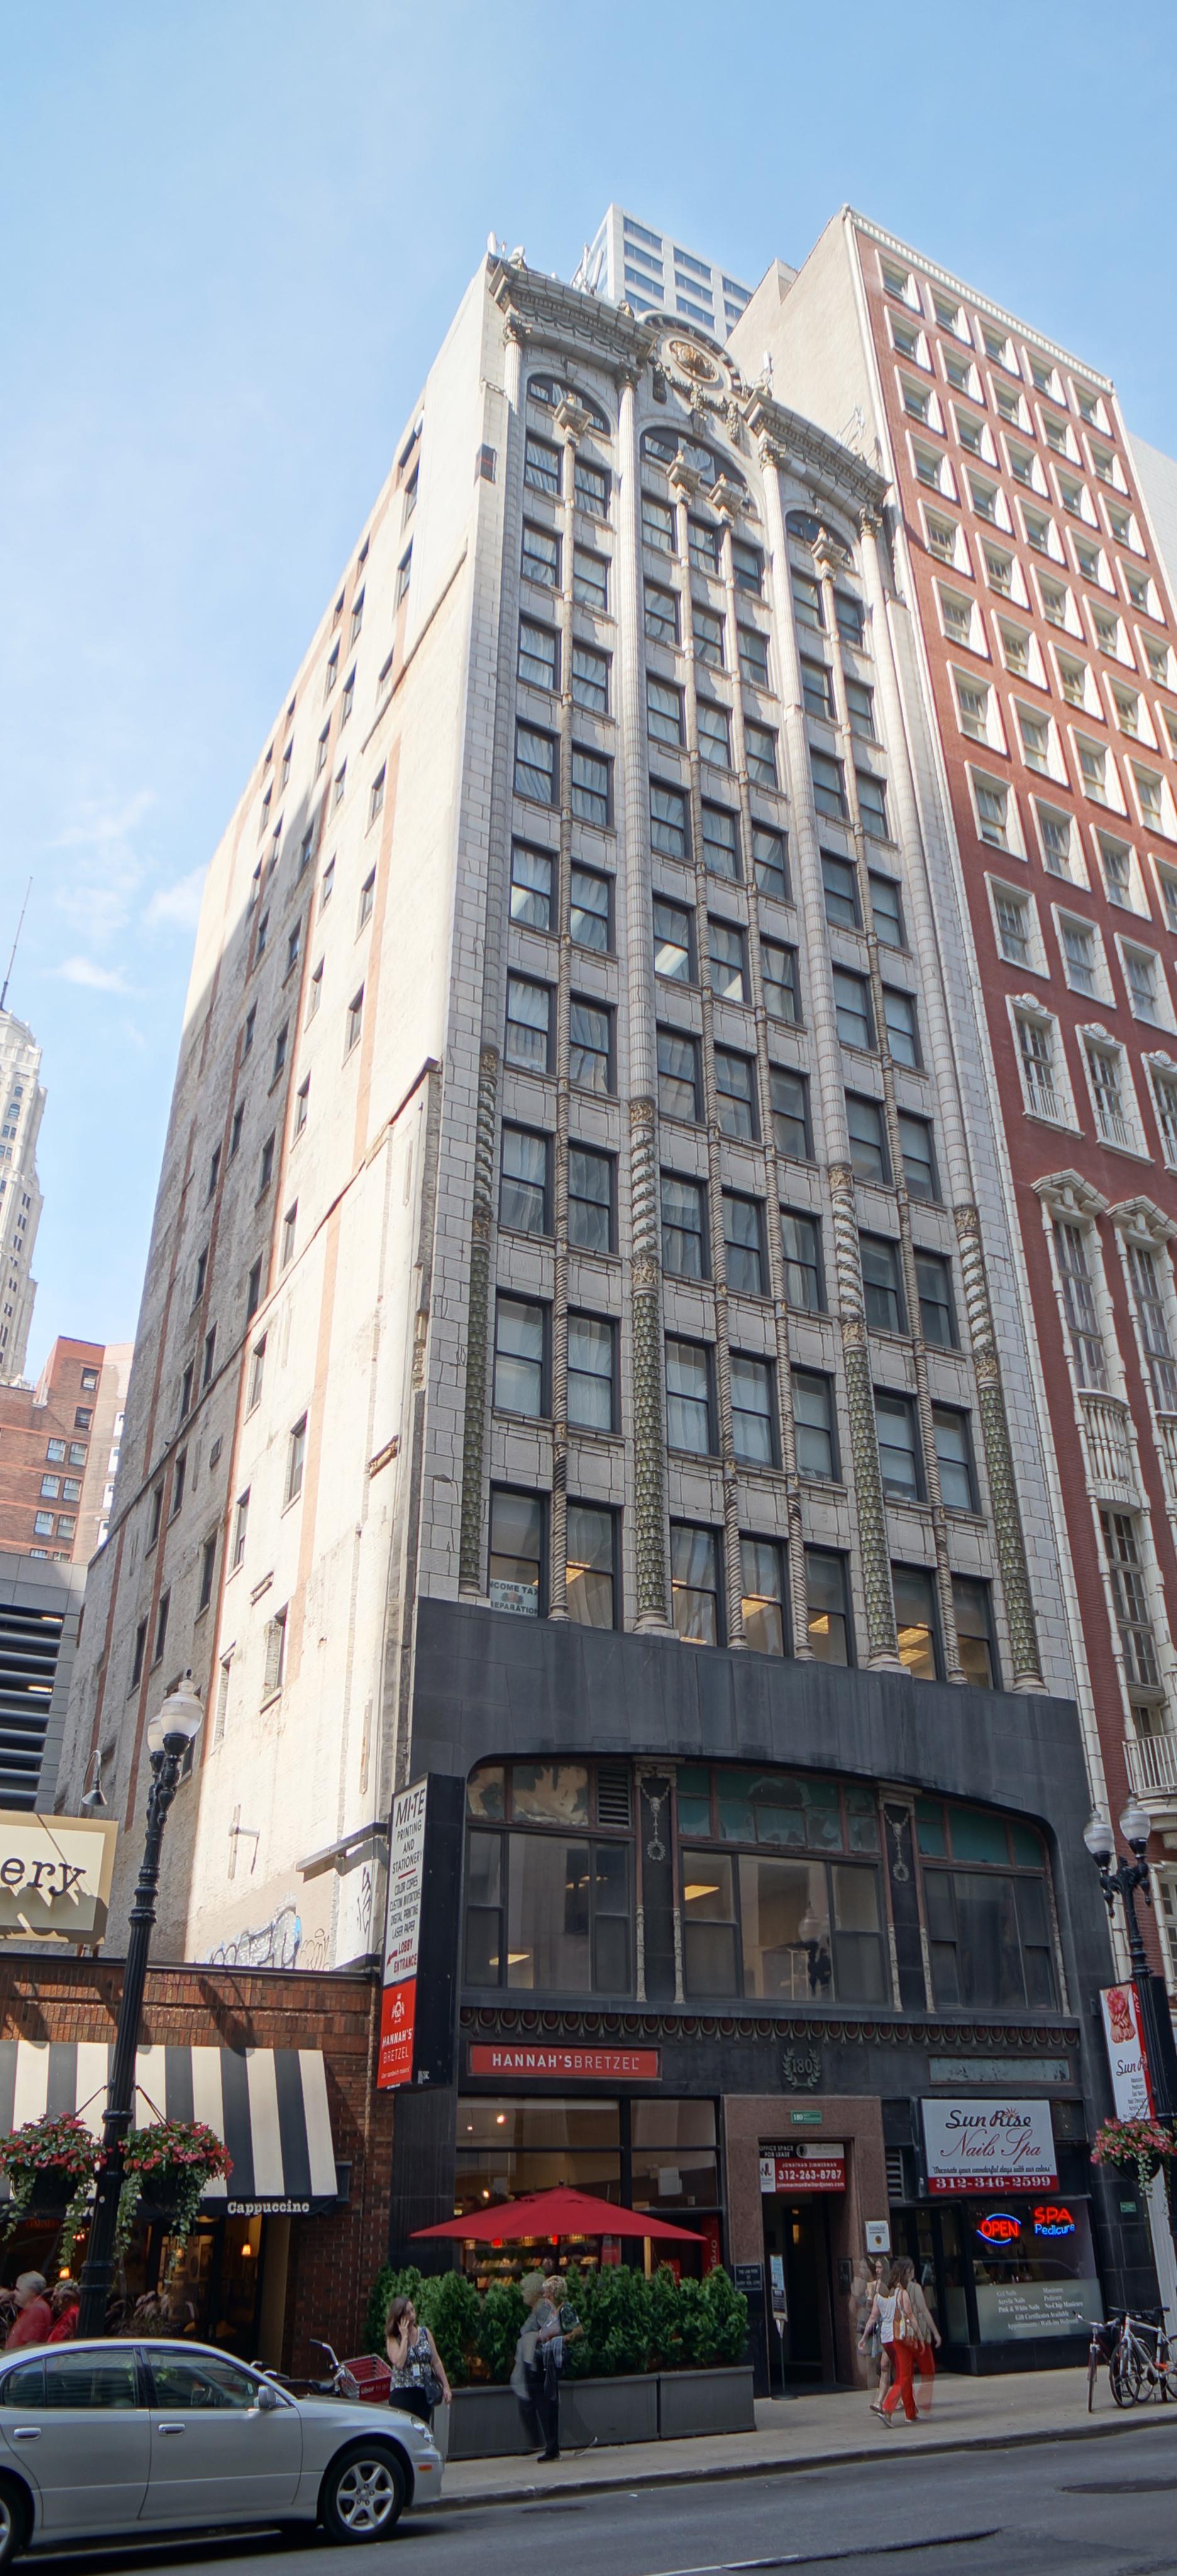 180 W Washington building